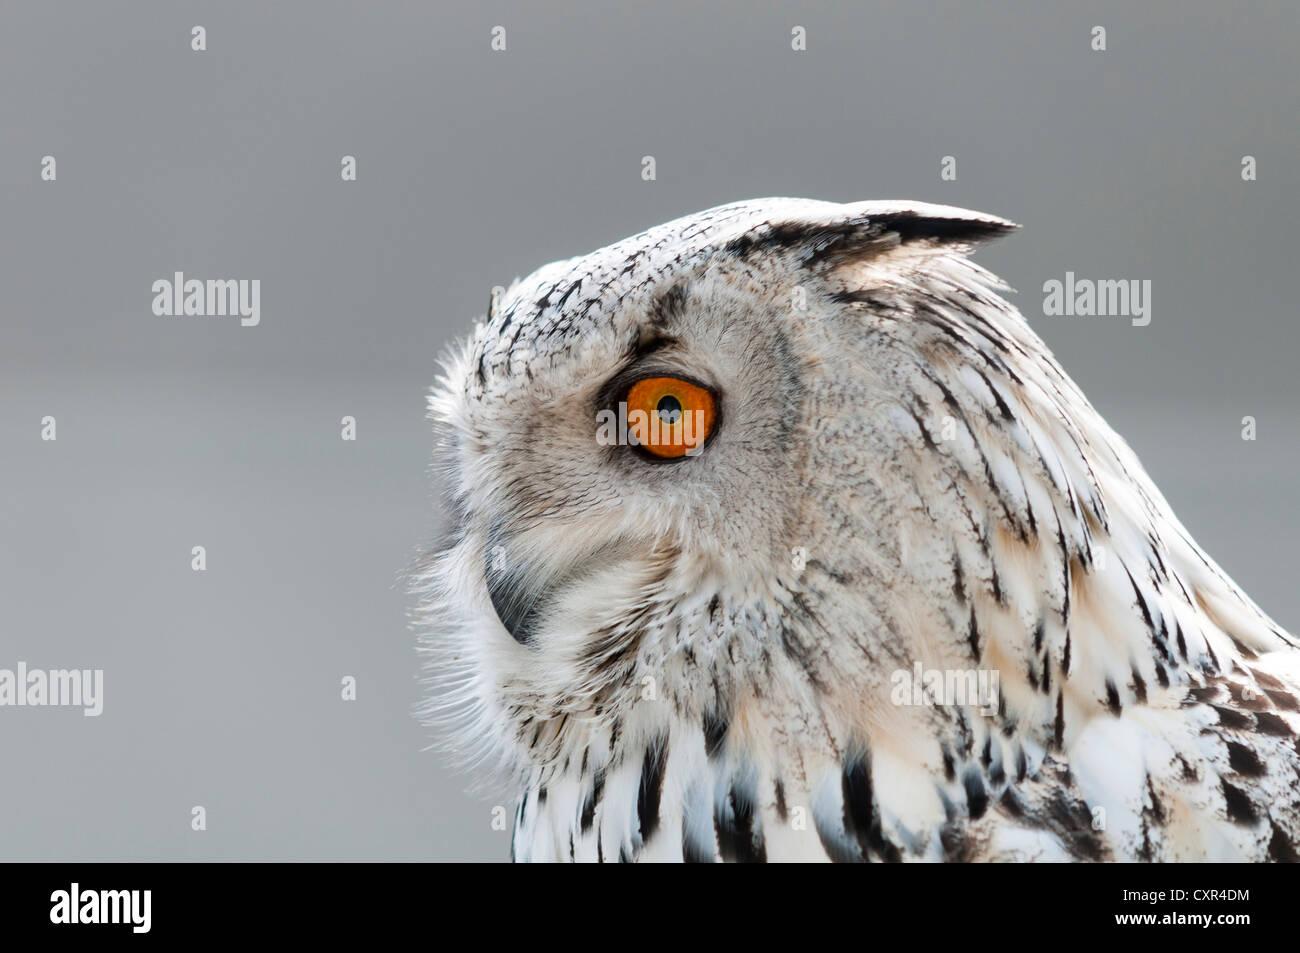 Civetta delle nevi (Nyctea scandiaca), Foto-Siegel mostra fotografica, Erfurt, Turingia, Germania, Europa Immagini Stock